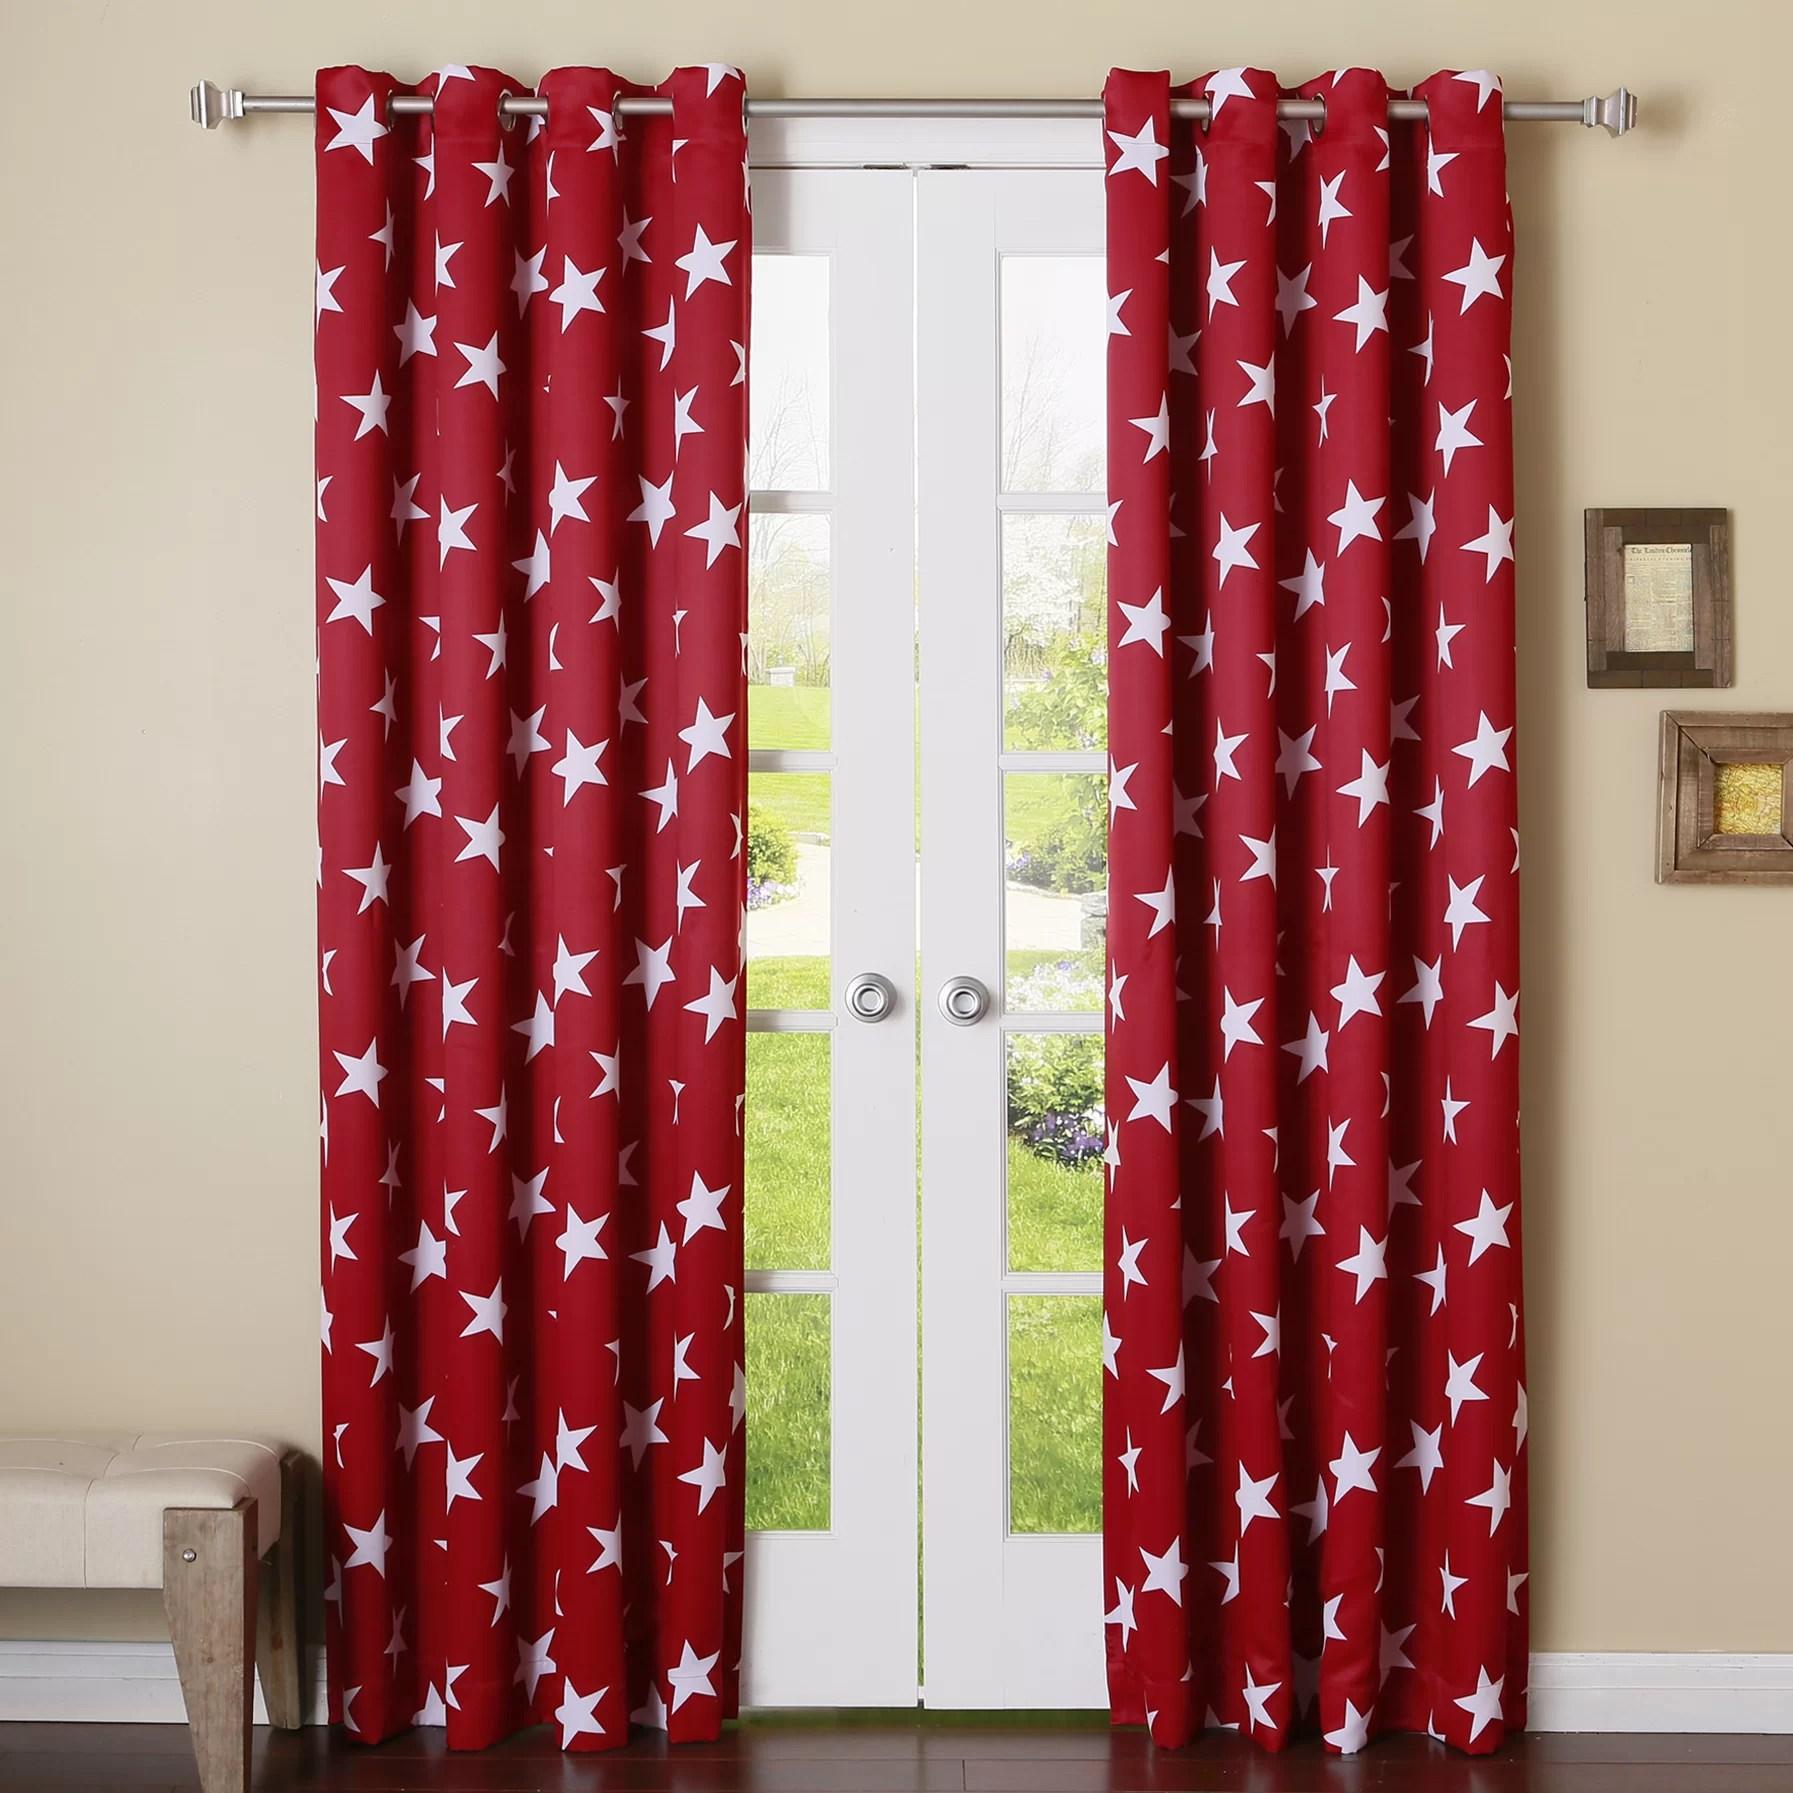 Best Home Fashion Inc Large Star Room Darkening Grommet Curtain